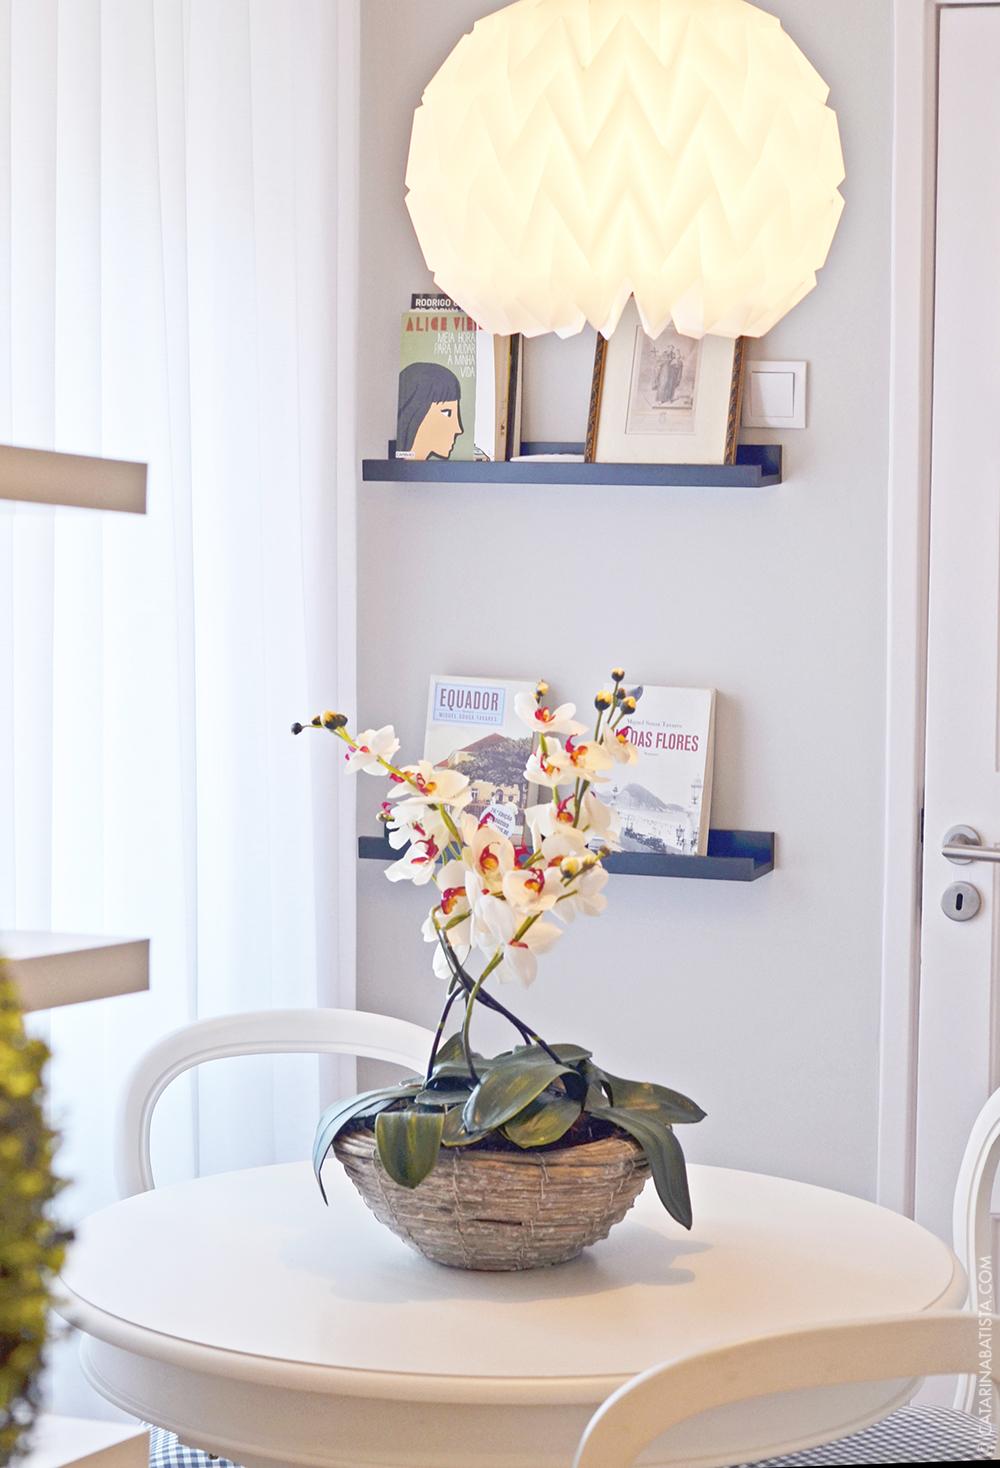 21-catarina-batista-arquitectura-design-interior-decoracao--apartamento-quarto-bedroom-livingroom-sala.jpg